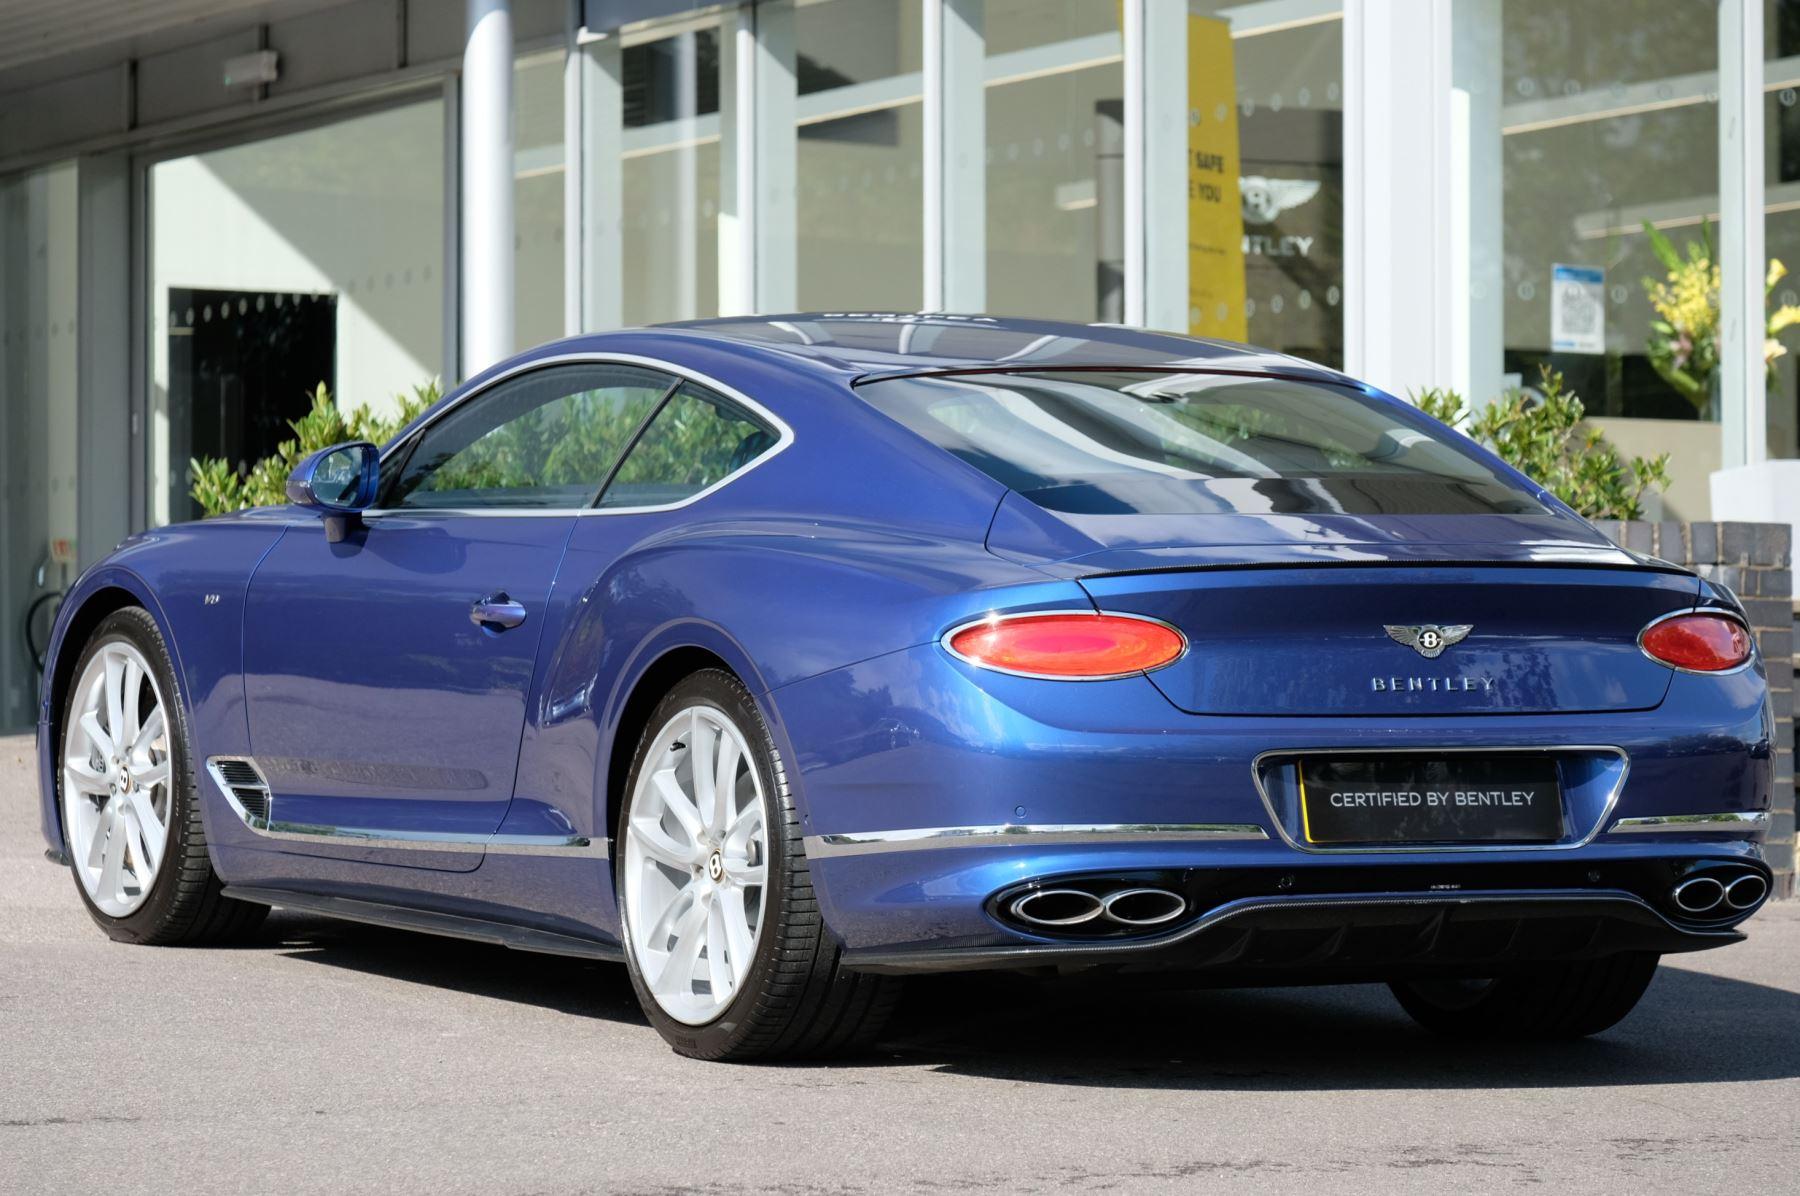 Bentley Continental GT 4.0 V8 2dr Mulliner Driving Specification image 5